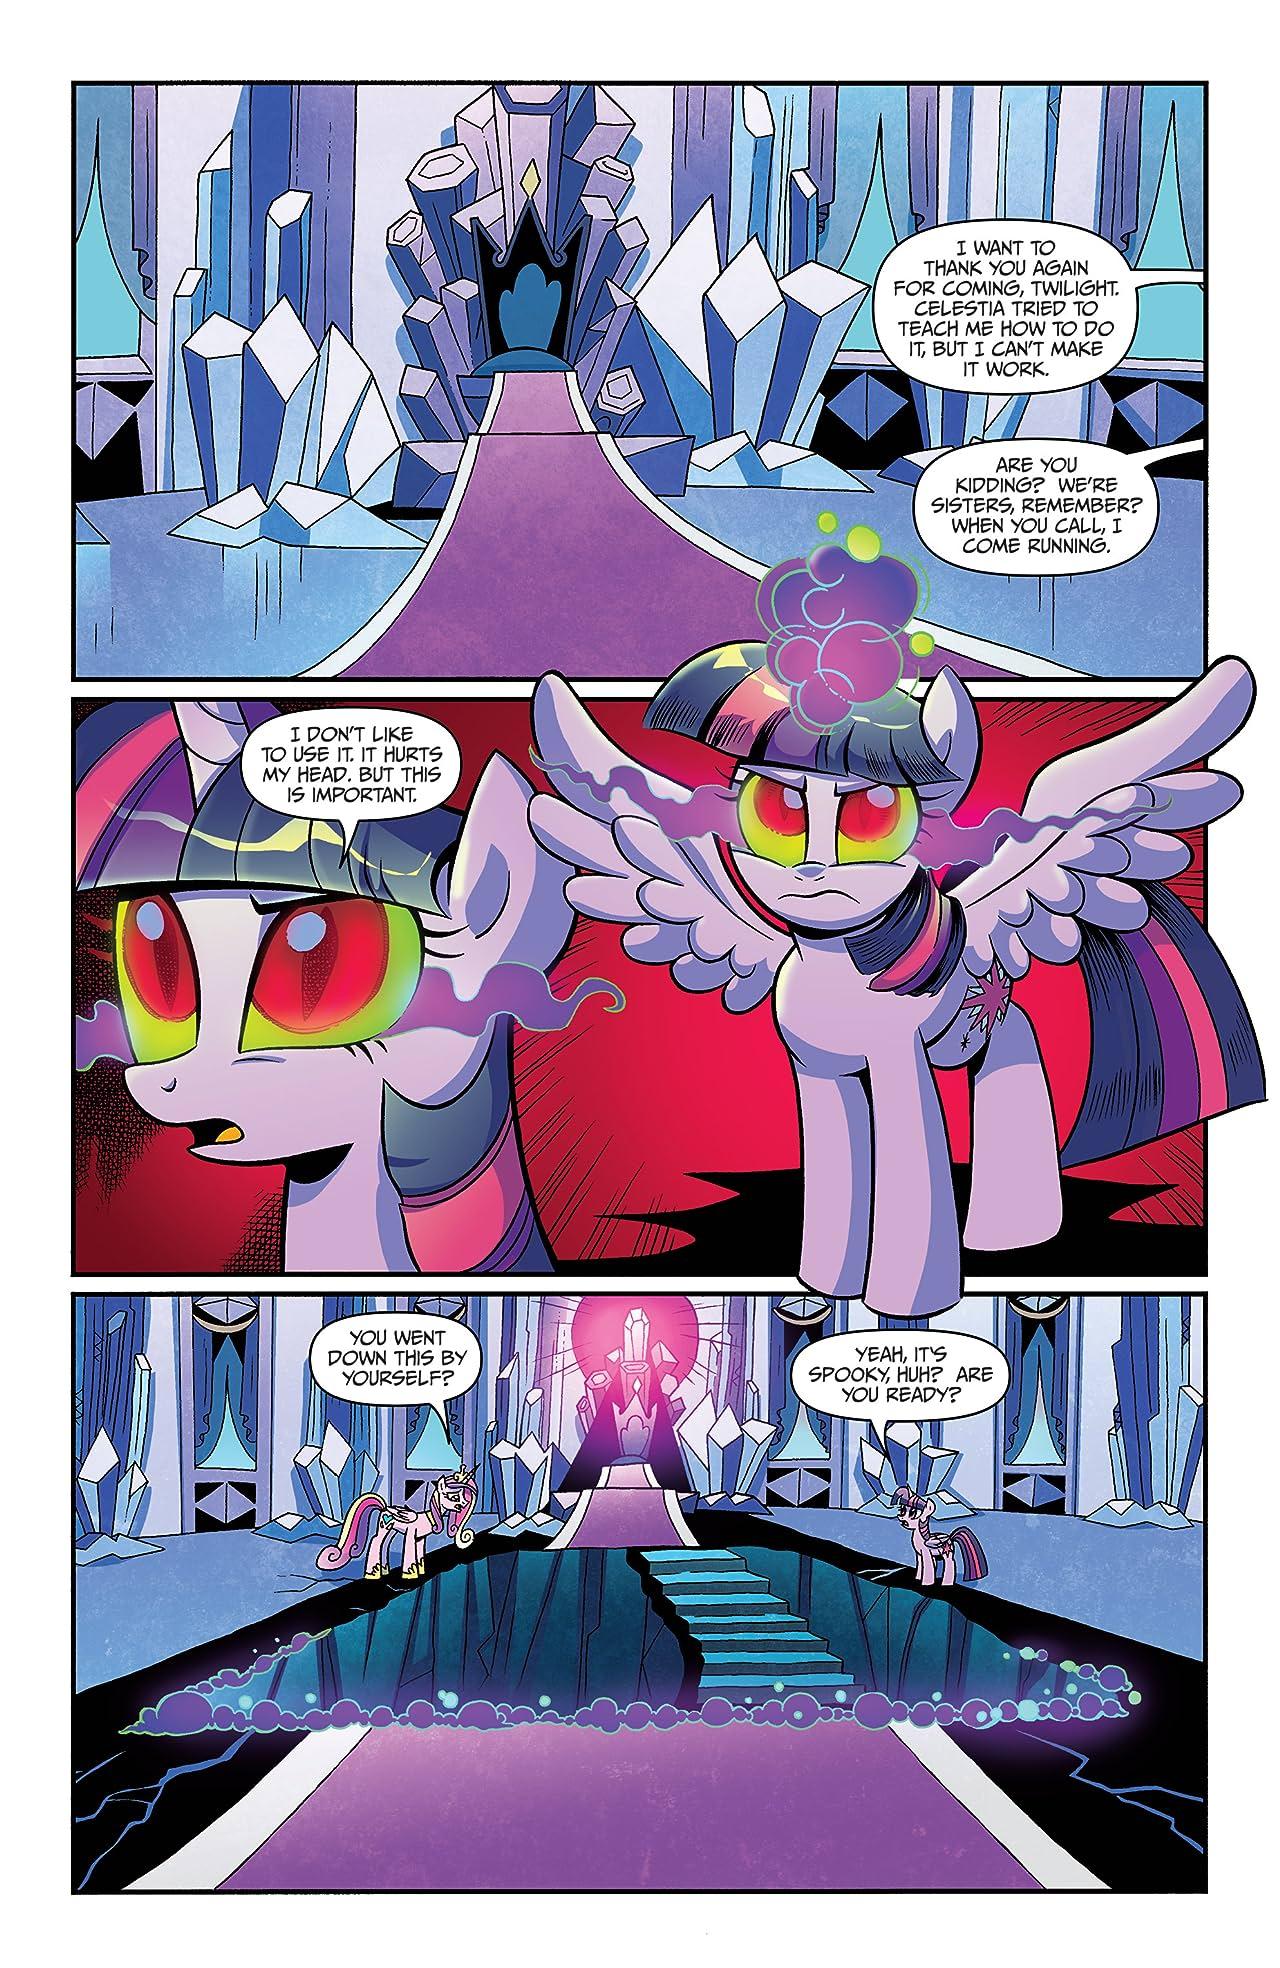 My Little Pony: FIENDship is Magic #1: Sombra